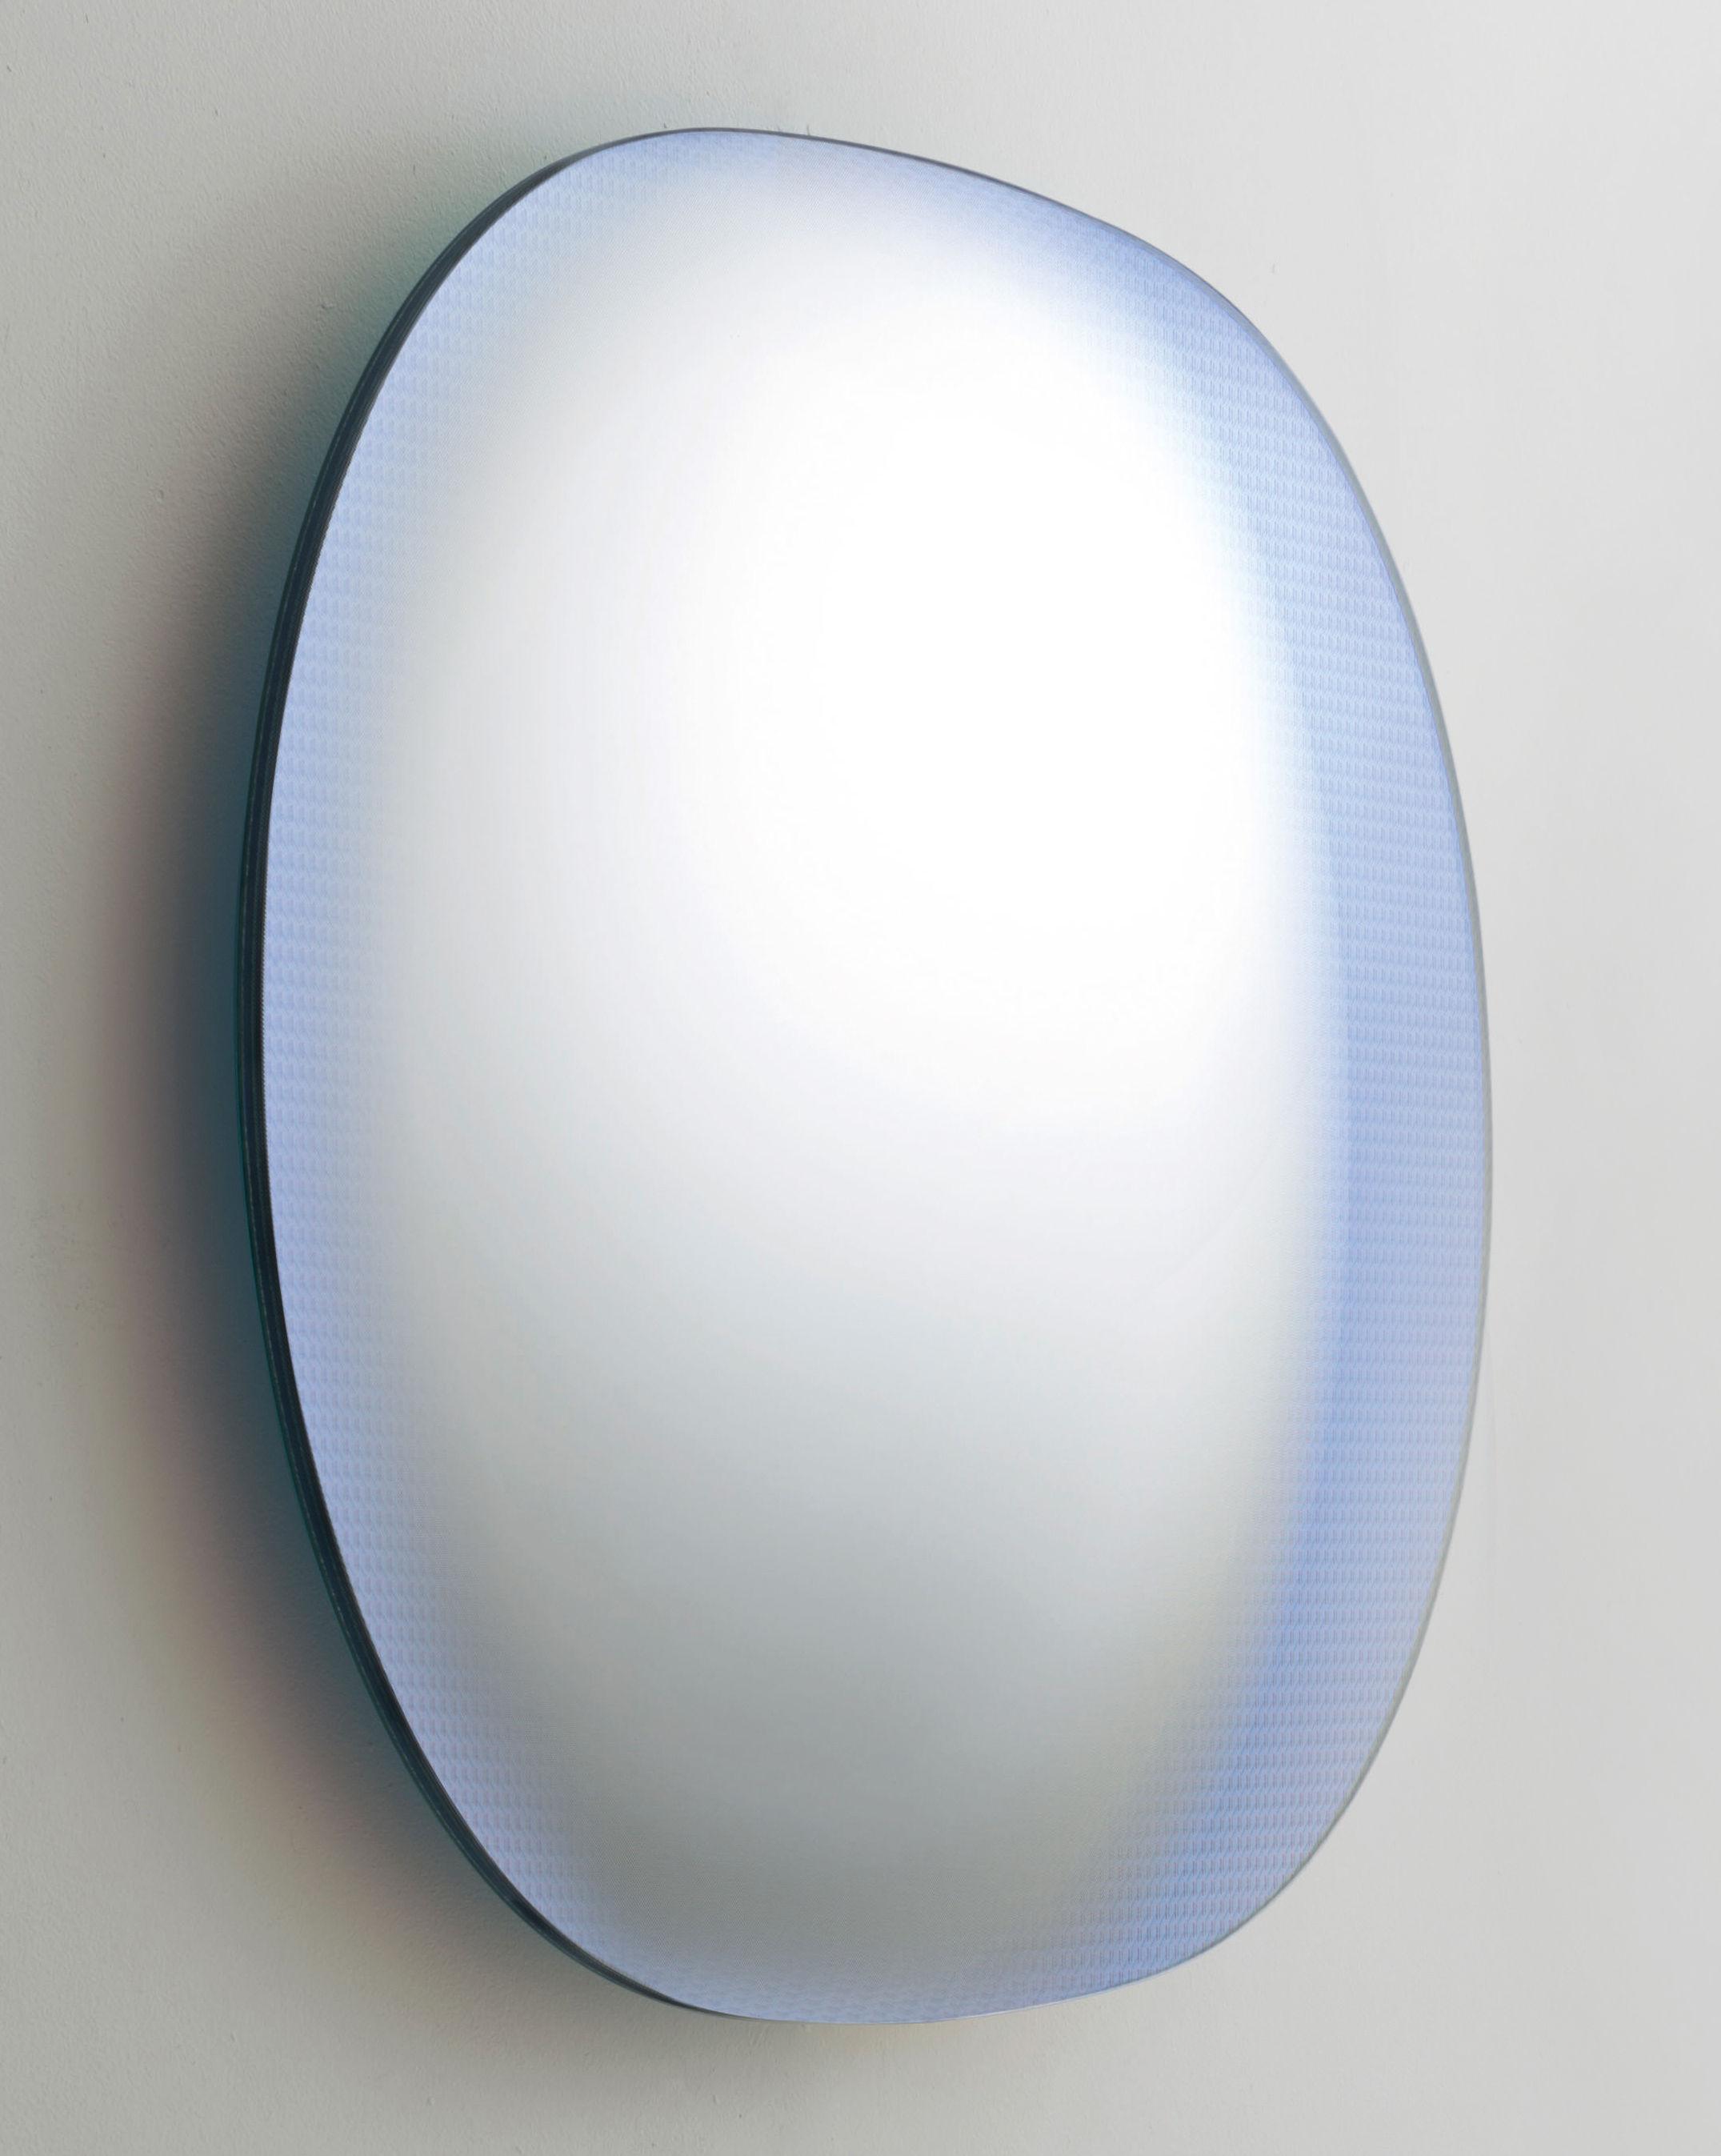 Decoration - Mirrors - Shimmer Wall mirror - L 100 x H 80 cm by Glas Italia - Multicolor - Glass